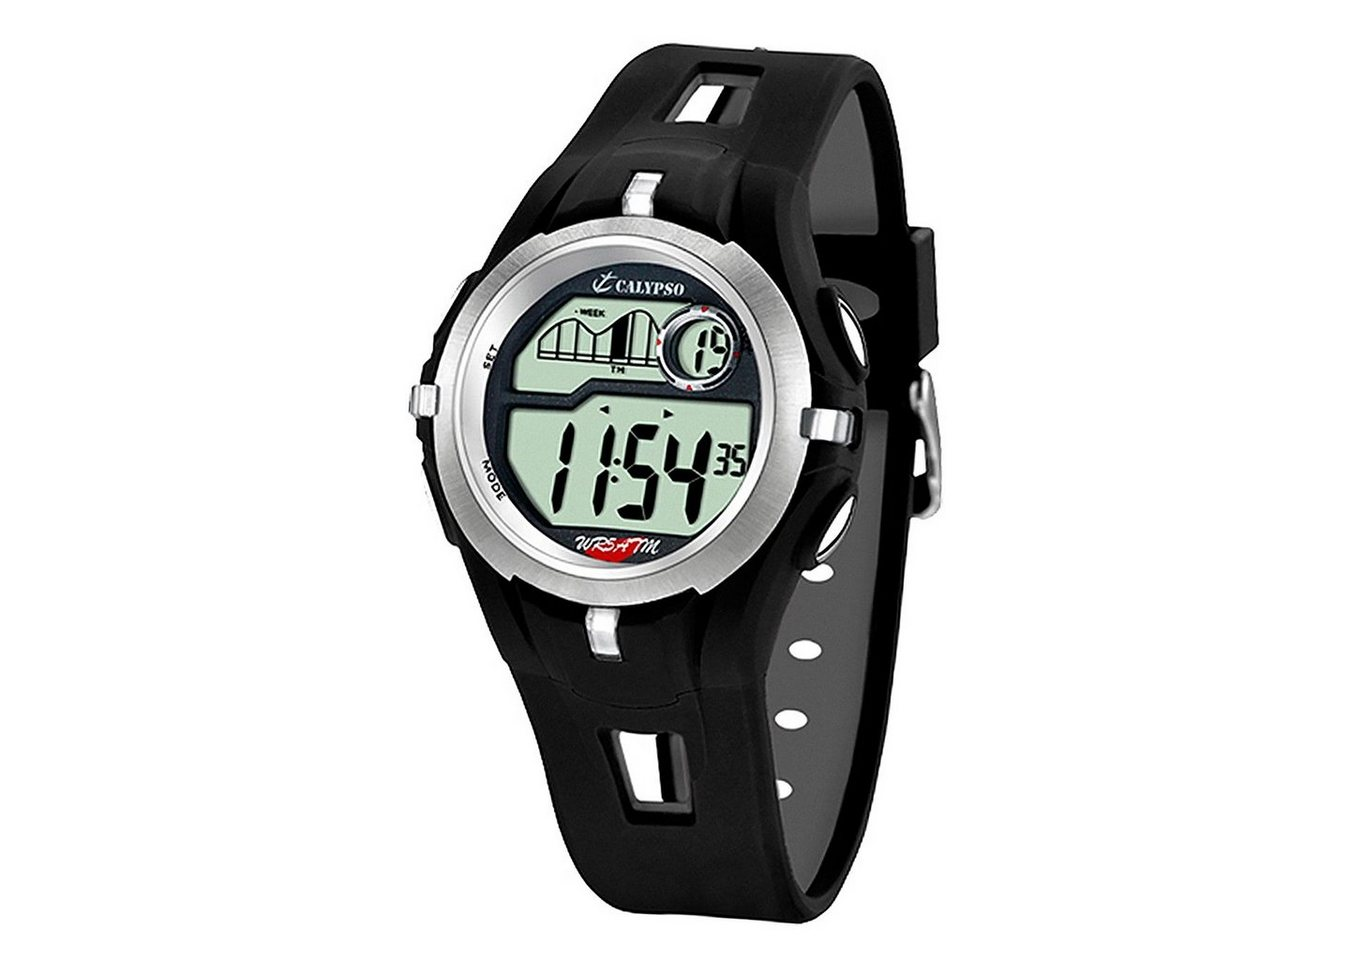 calypso watches -  Digitaluhr »UK5511/1 Calypso Herren Uhr K5511/1 Kunststoffband«, (Digitaluhr), Herren Armbanduhr rund, PURarmband schwarz, Sport